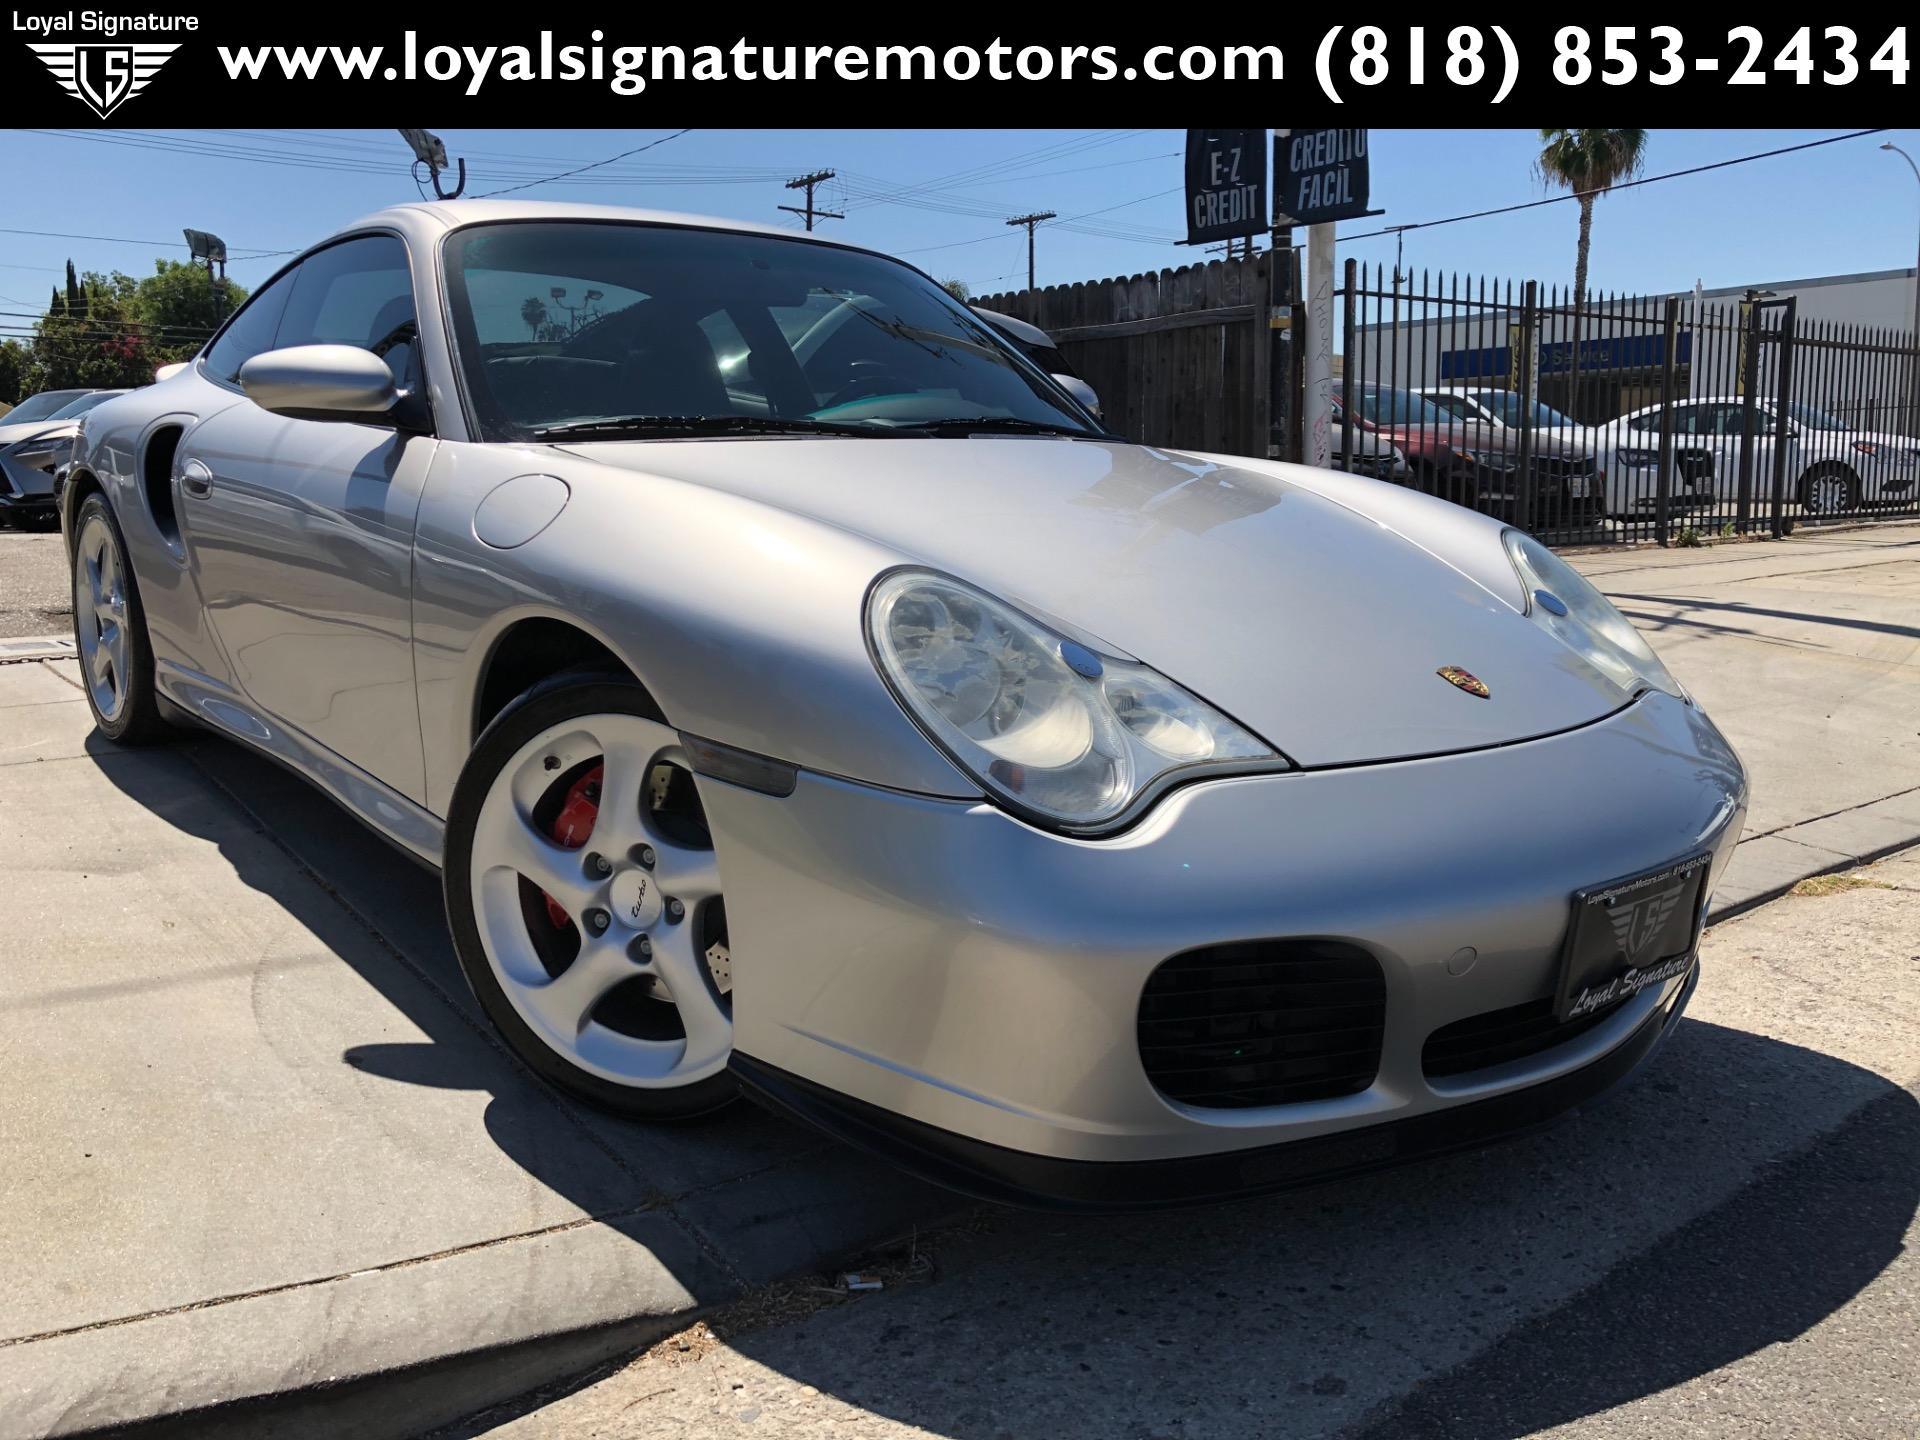 Used 2001 Porsche 911 Turbo | Van Nuys, CA